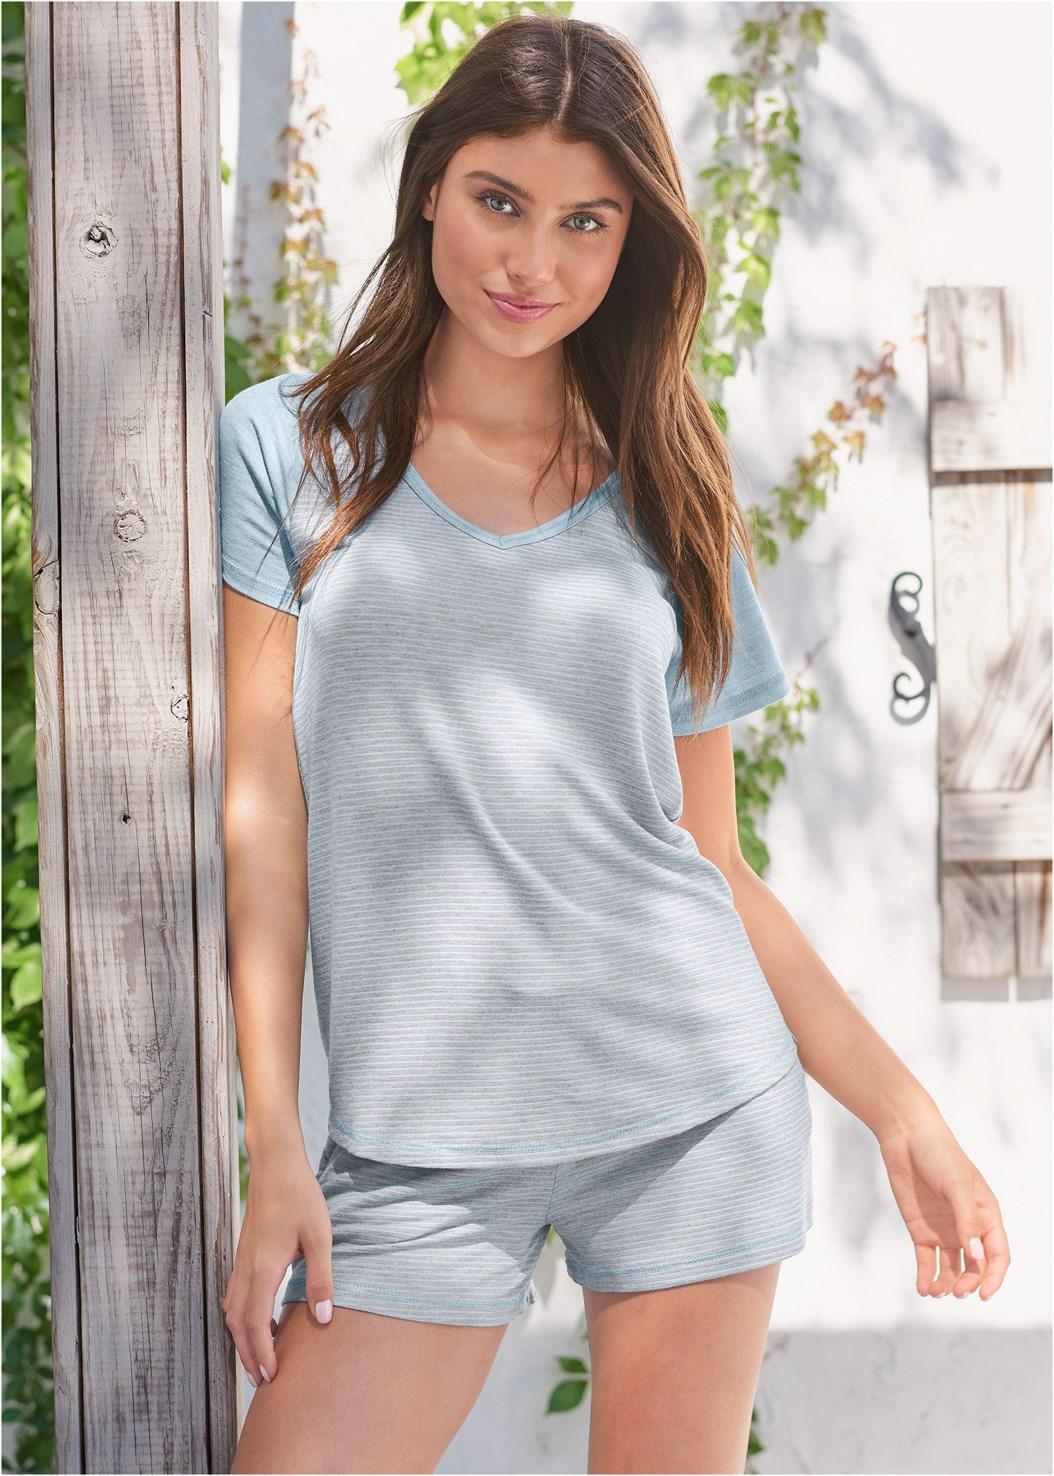 Stripe Sleep Shirt,Striped Sleep Jogger